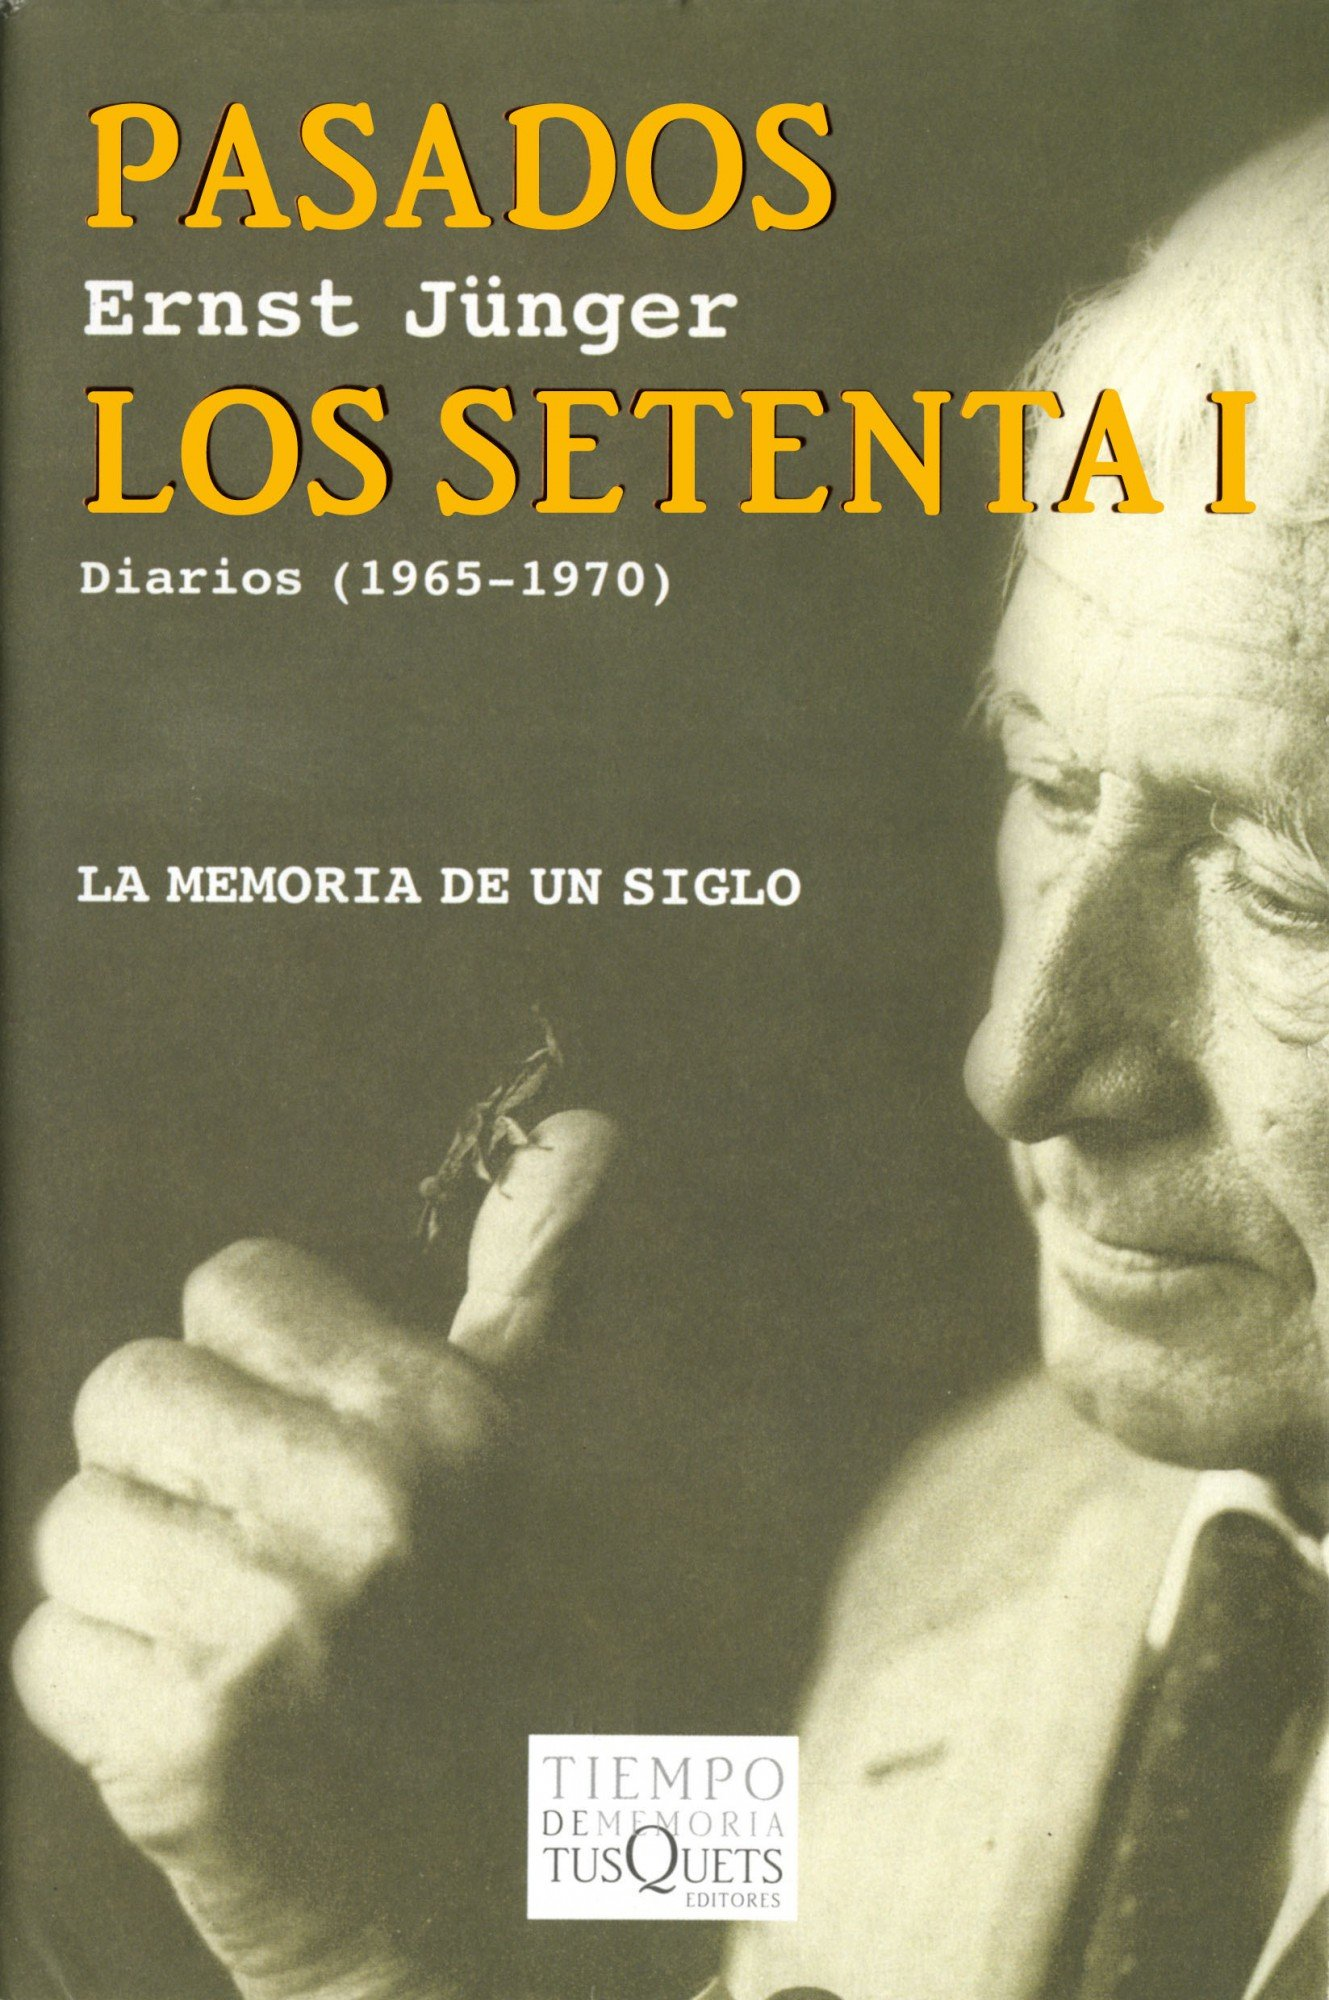 Pasados Los Setenta I - Diarios 1965-1970 (Spanish Edition): Ernst Jünger: 9788483104439: Amazon.com: Books